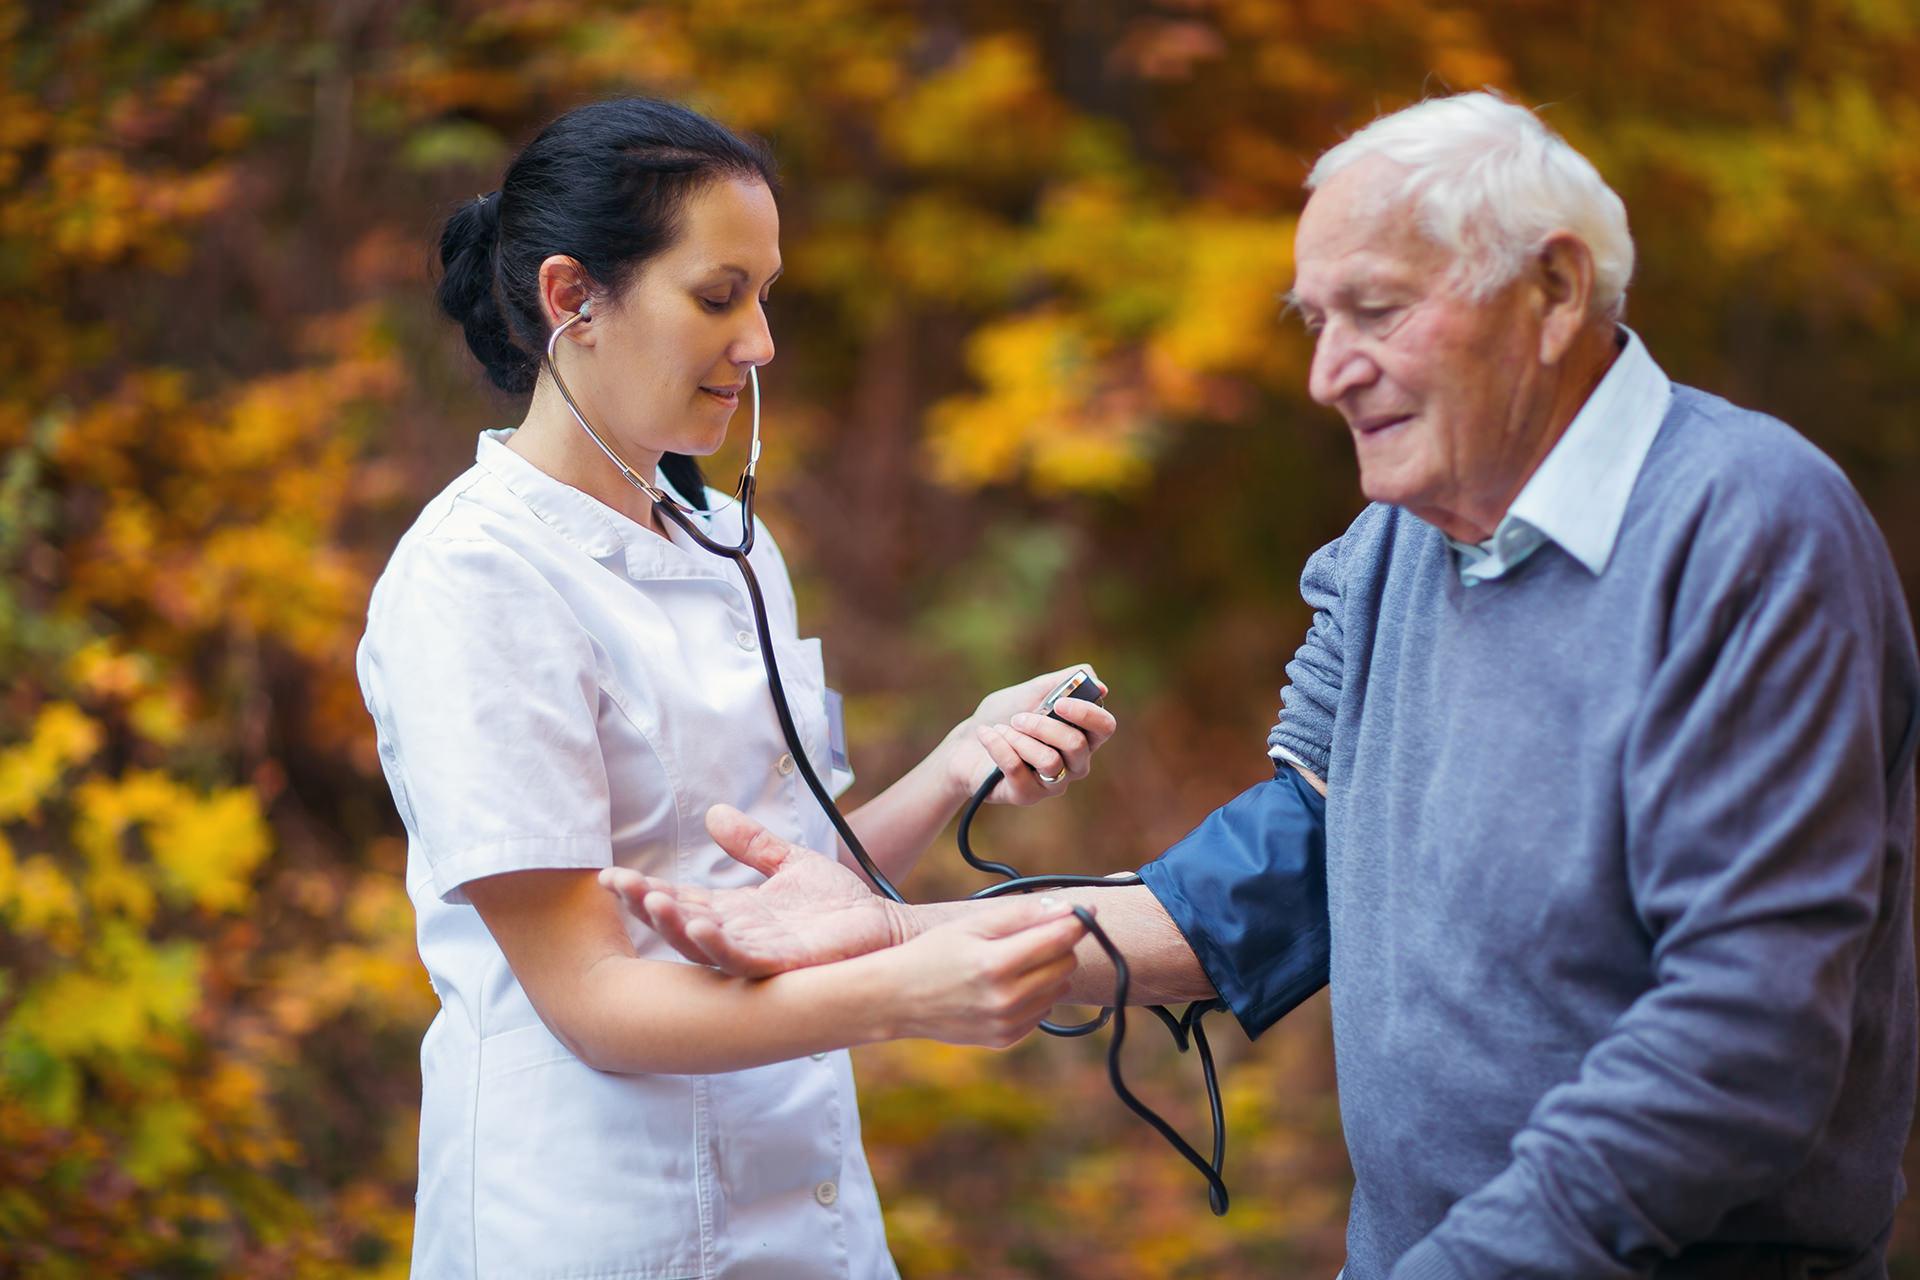 Caretaker check health to old man